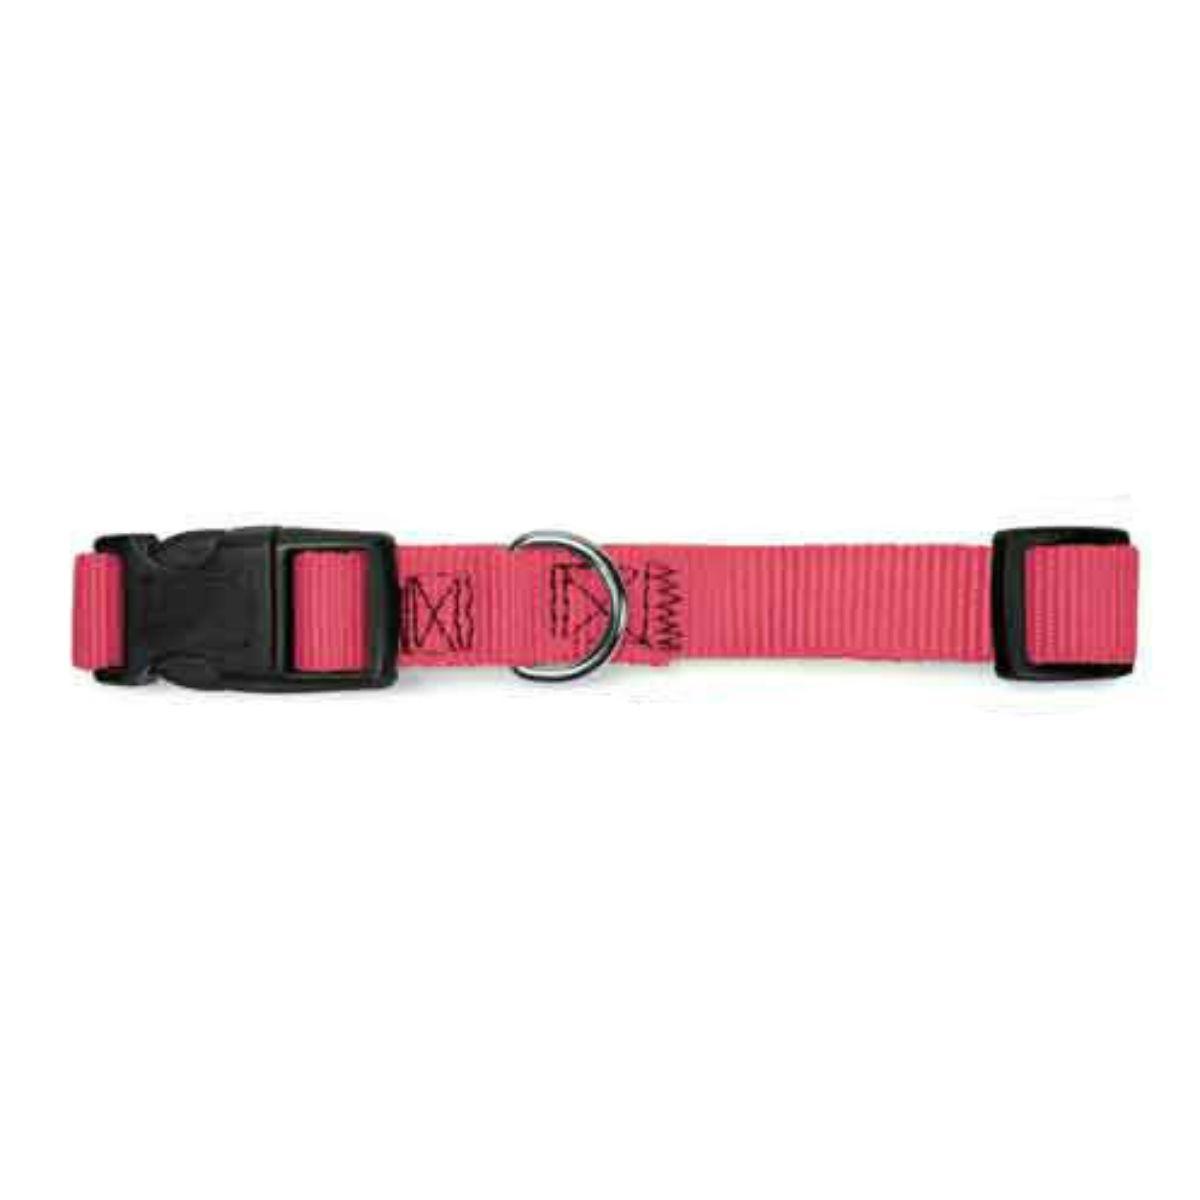 Guardian Gear Nylon Brites Dog Collar - Flamingo Pink